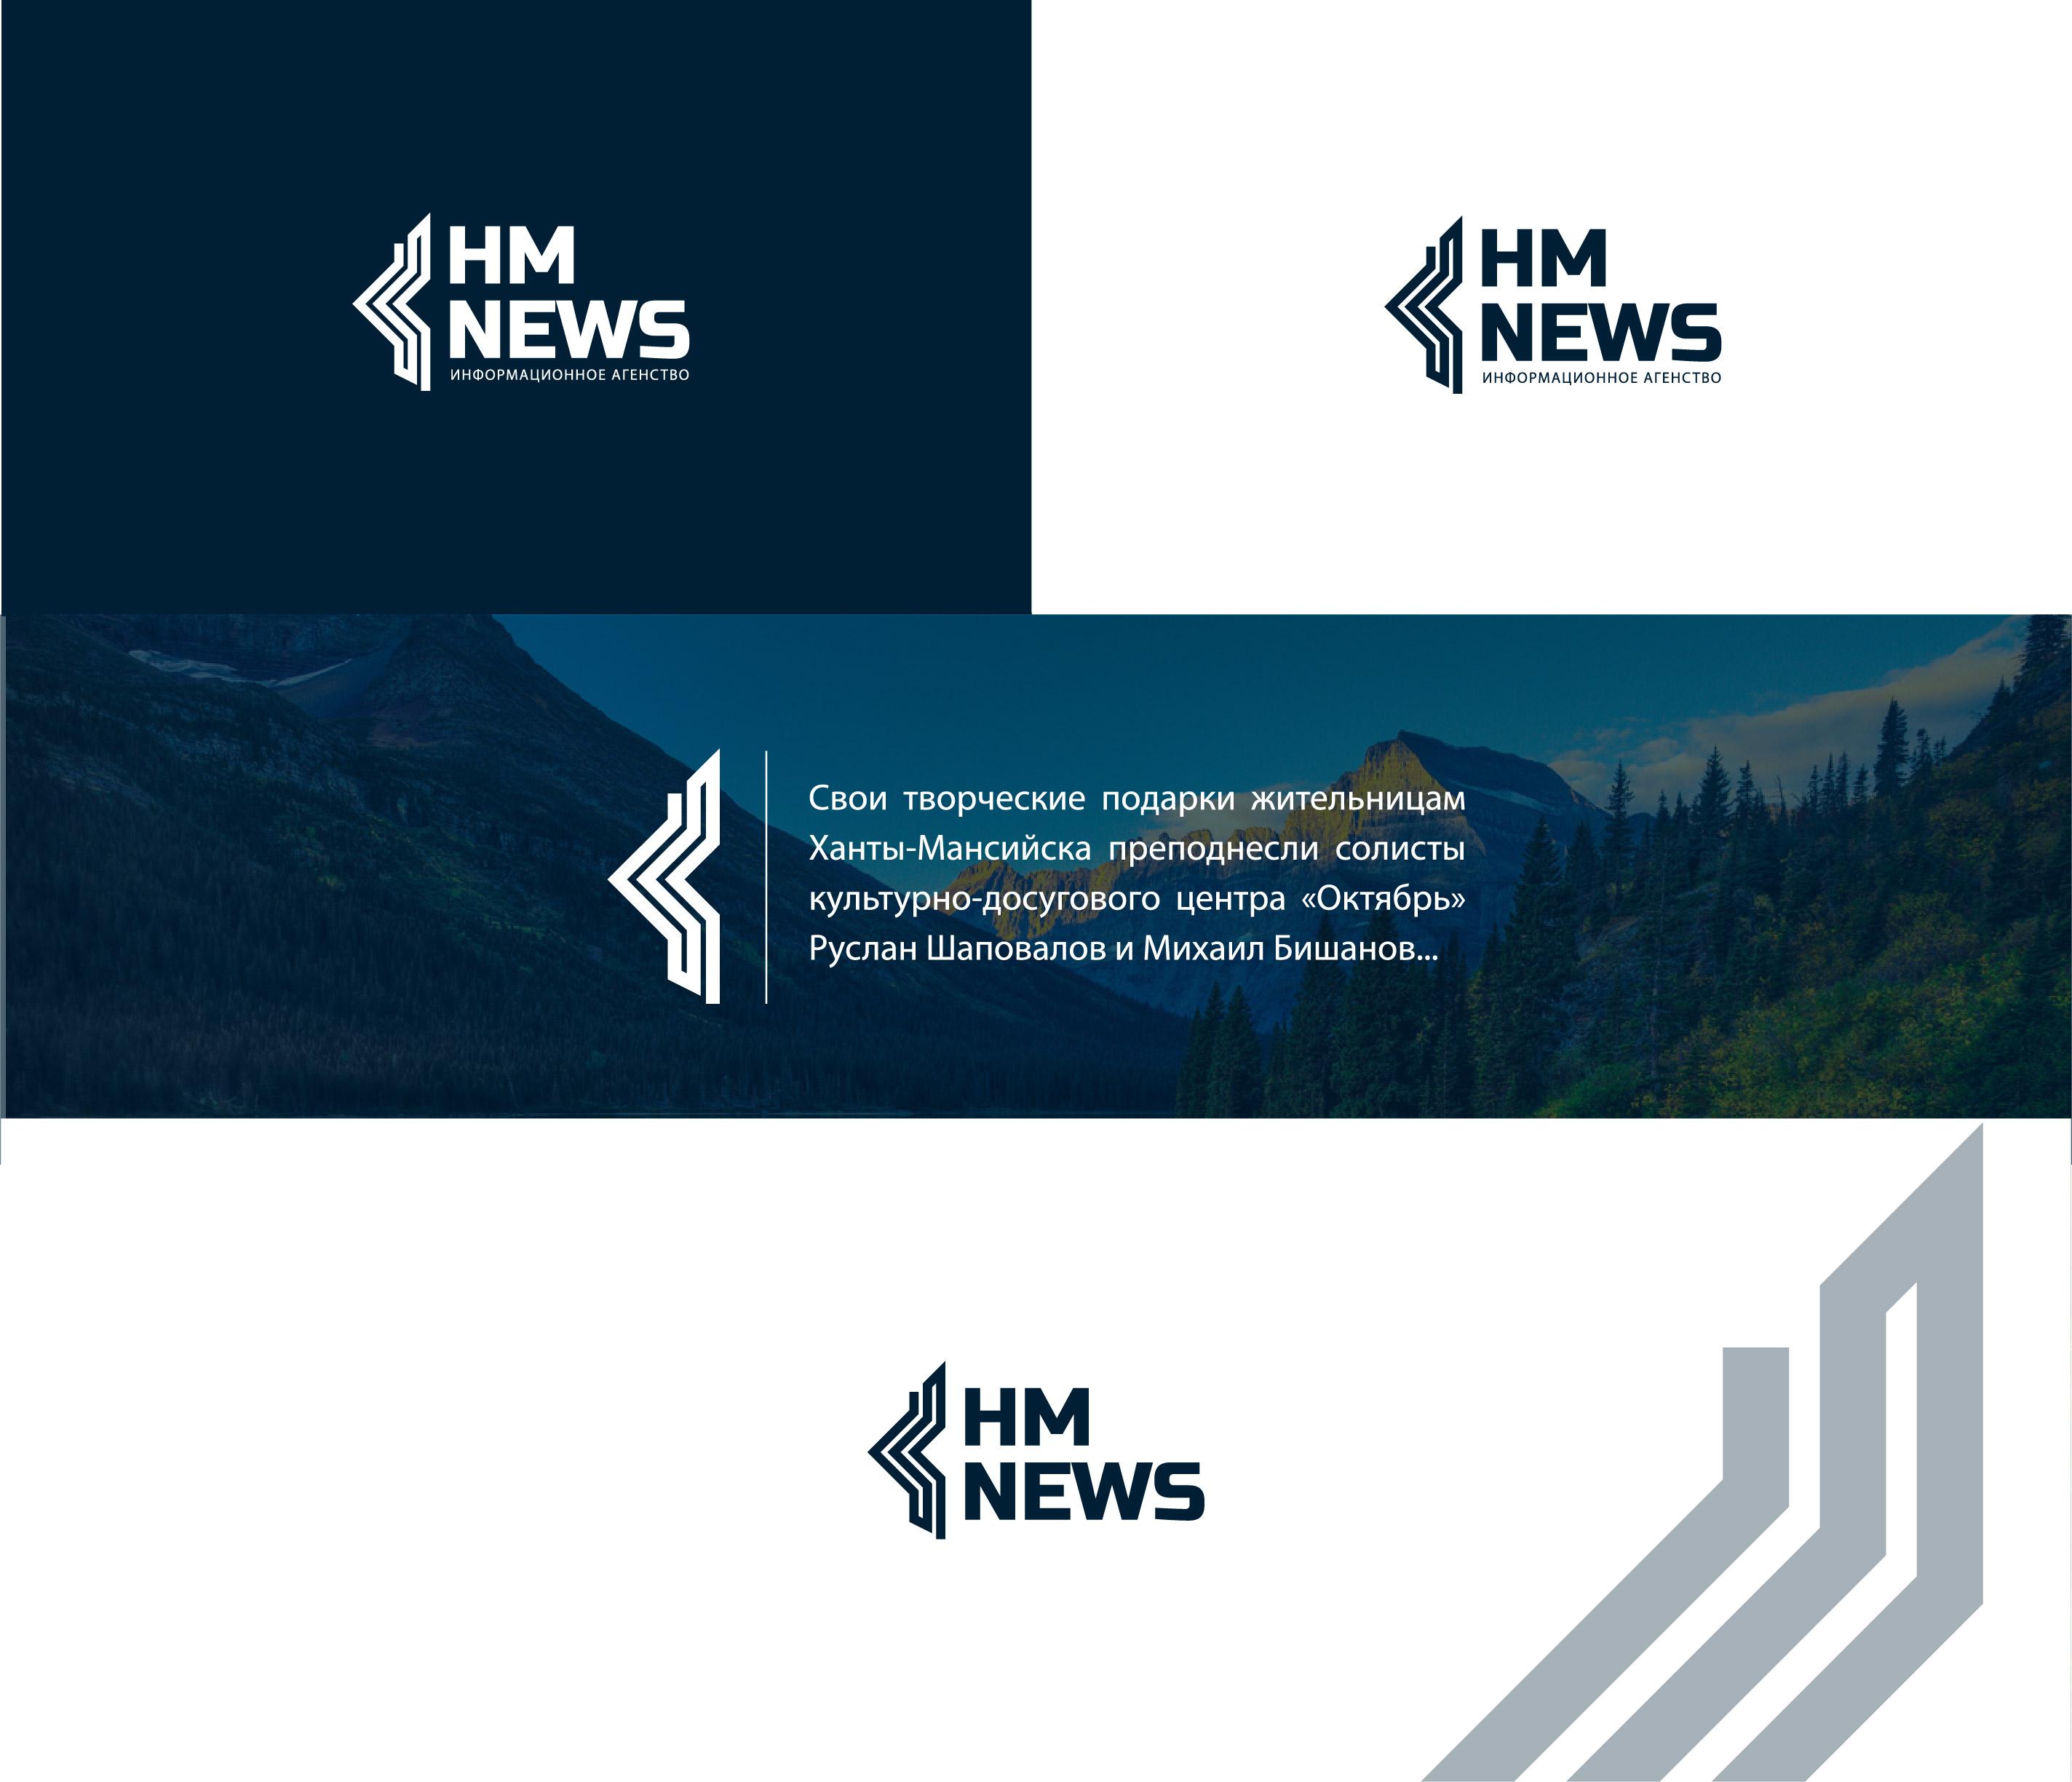 Логотип для информационного агентства фото f_2105aa63fb583dc0.jpg